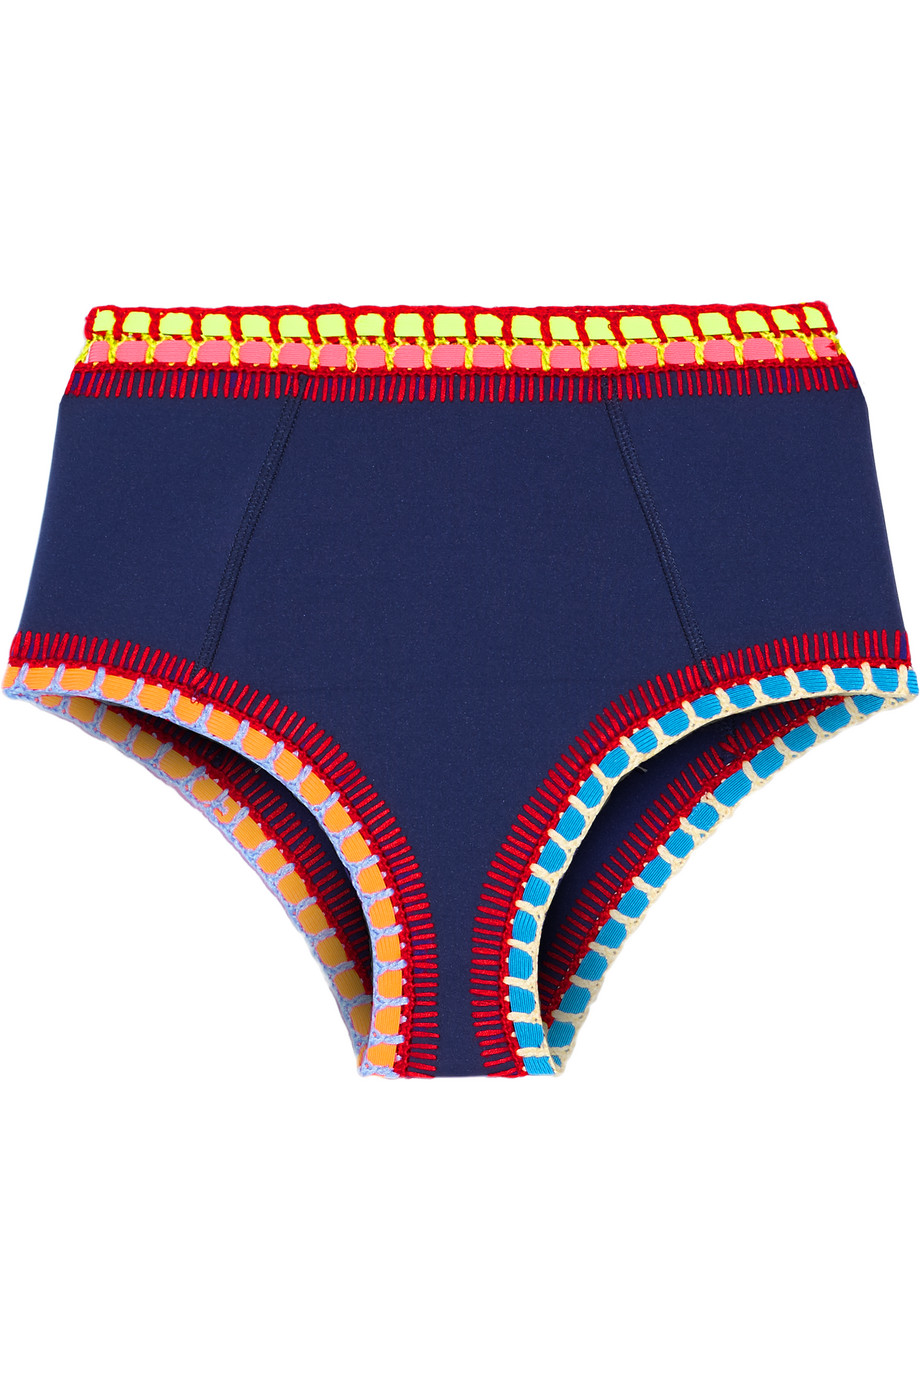 Tasmin Crochet-Trimmed Bikini Briefs, Navy, Women's, Size: L